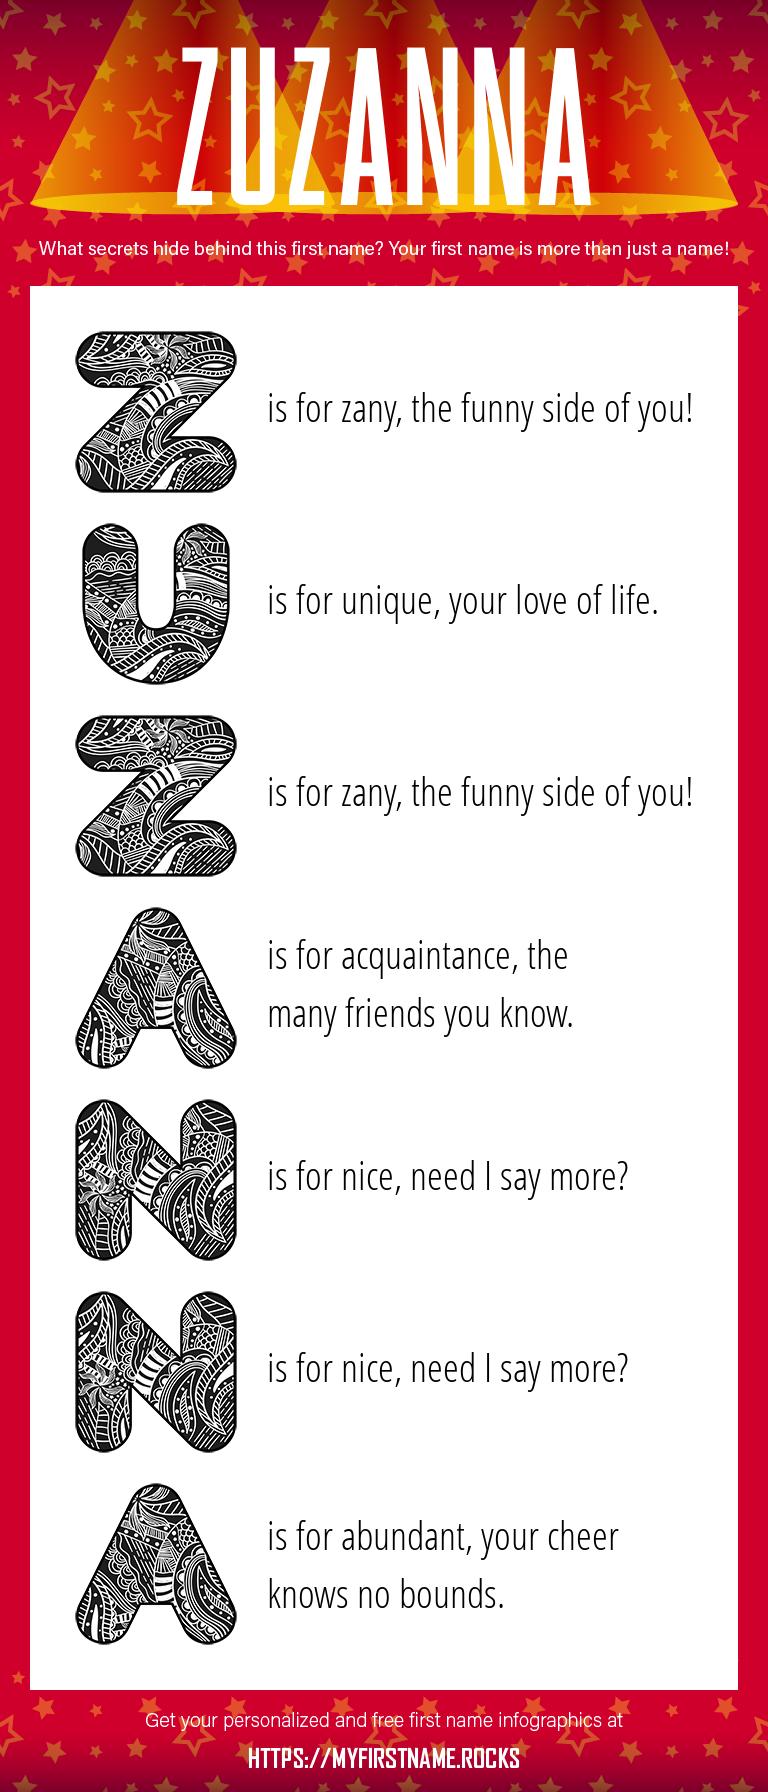 Zuzanna Infographics